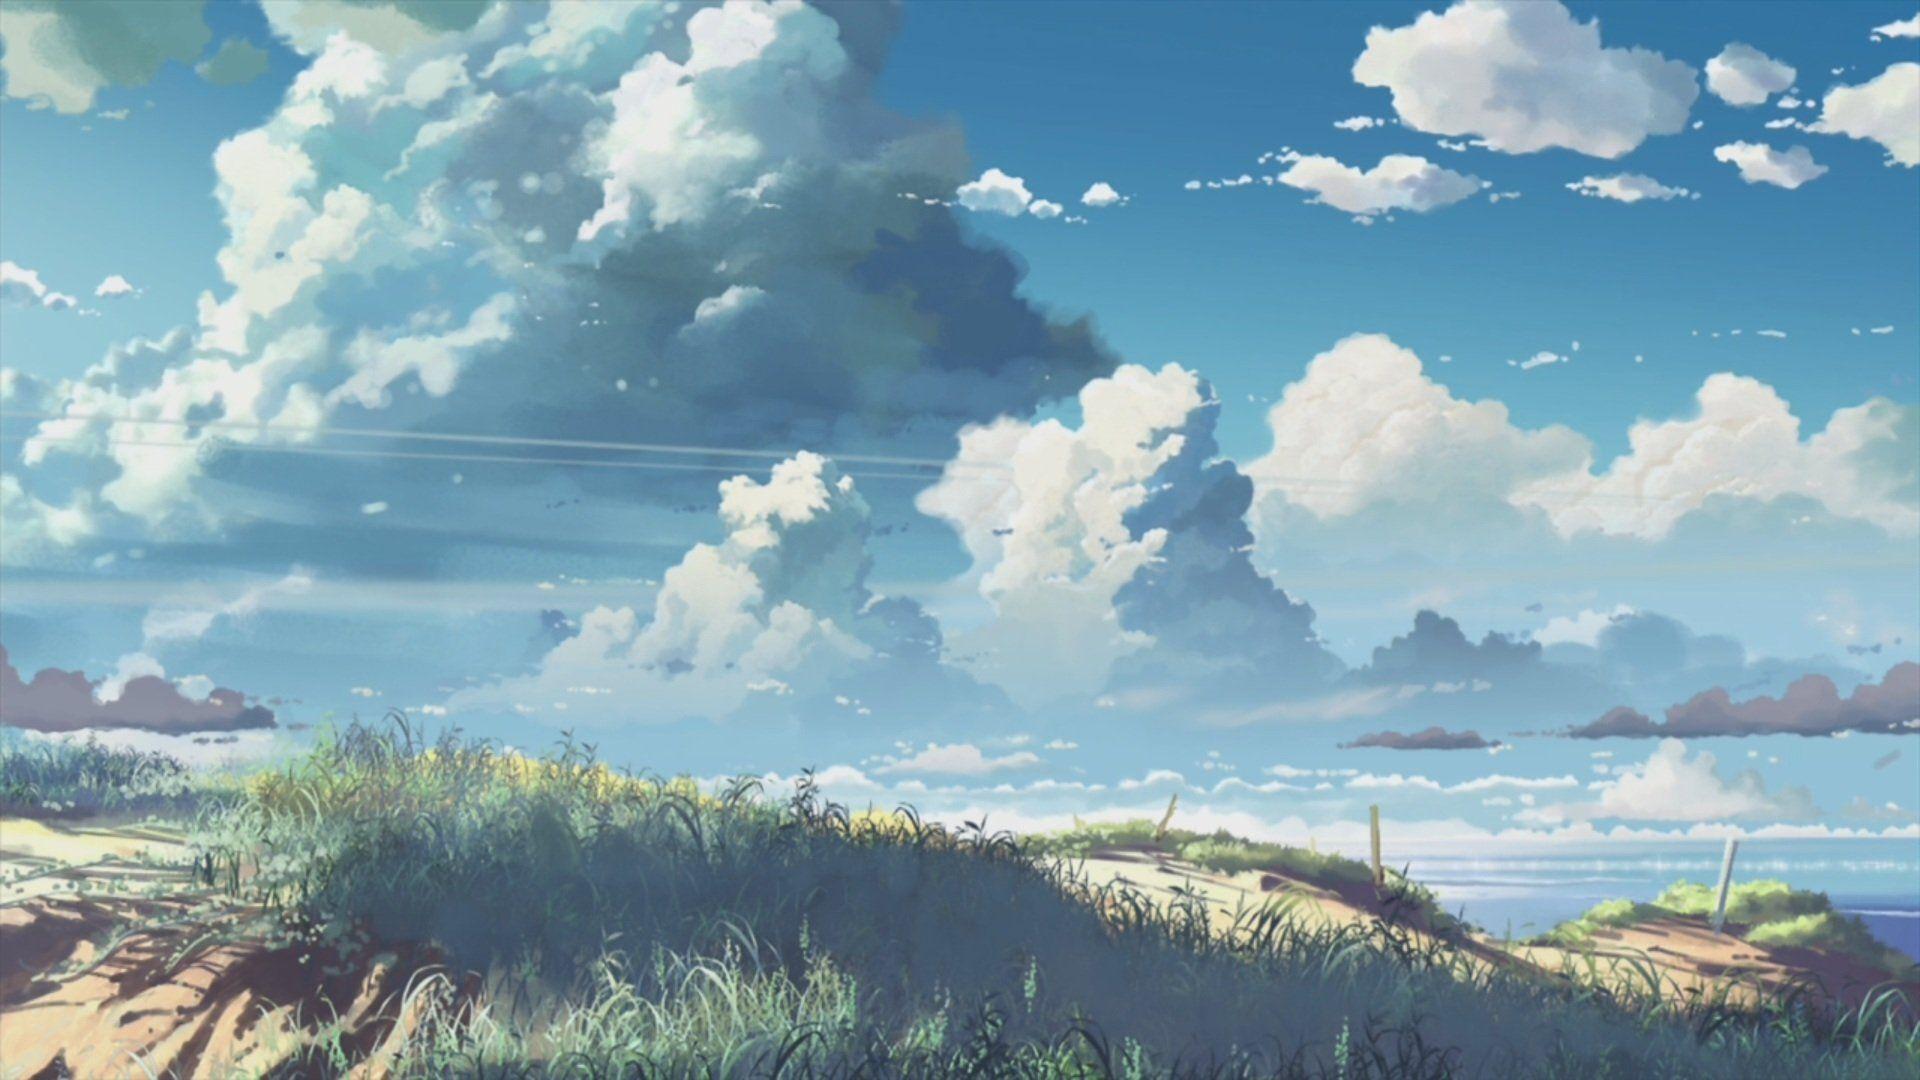 Anime Scenery Anime Beautiful Scenery Wallpaper Hd Http